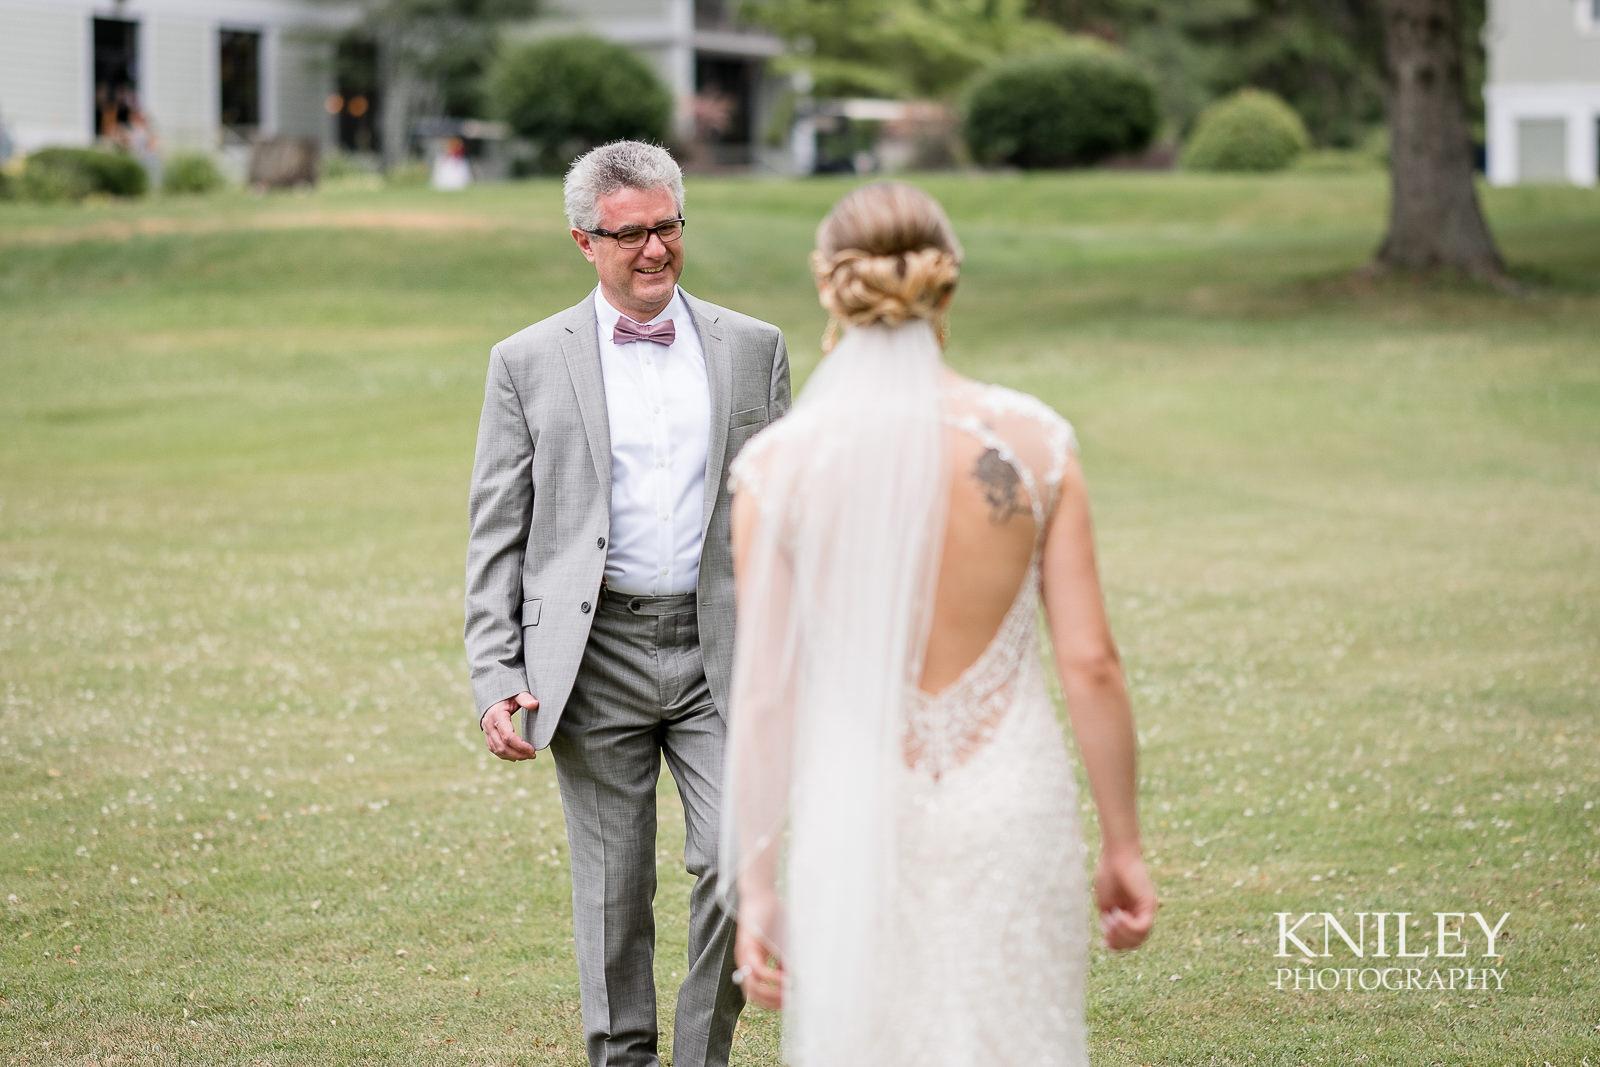 021 - Ontario Golf Club Wedding Pictures - XT2A6507.jpg